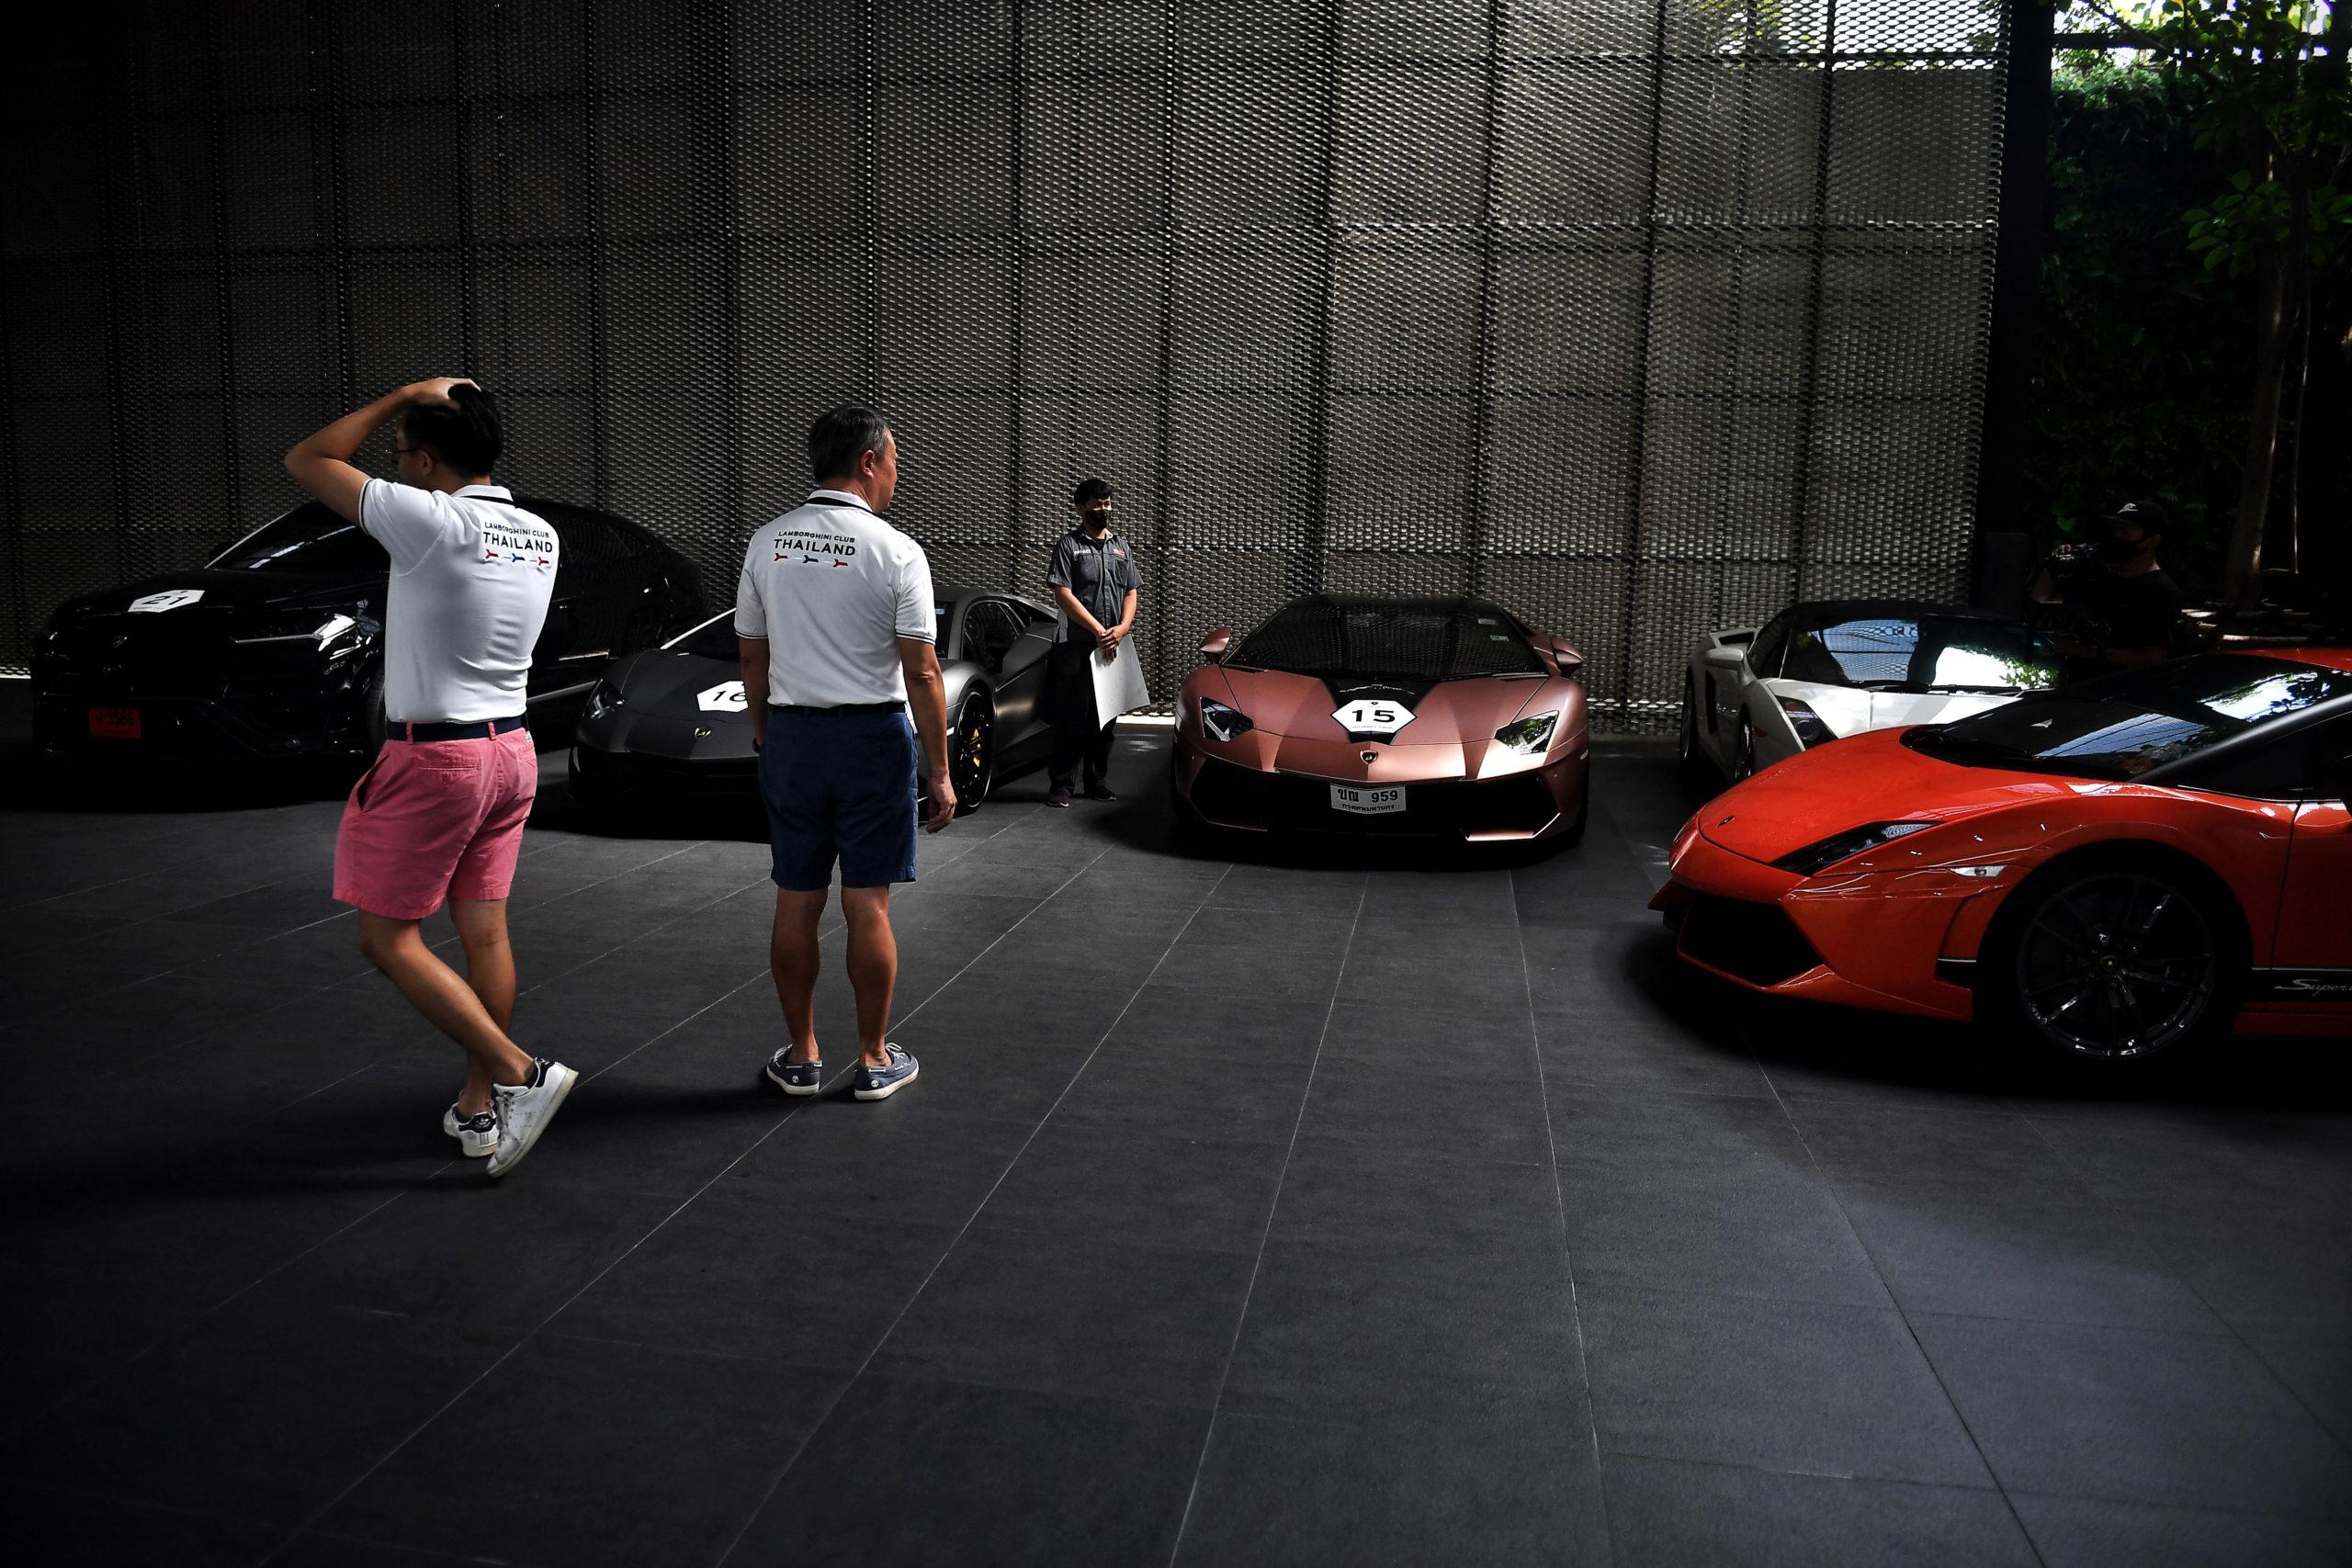 Supercars and champagne: Bangkok's rich purr through